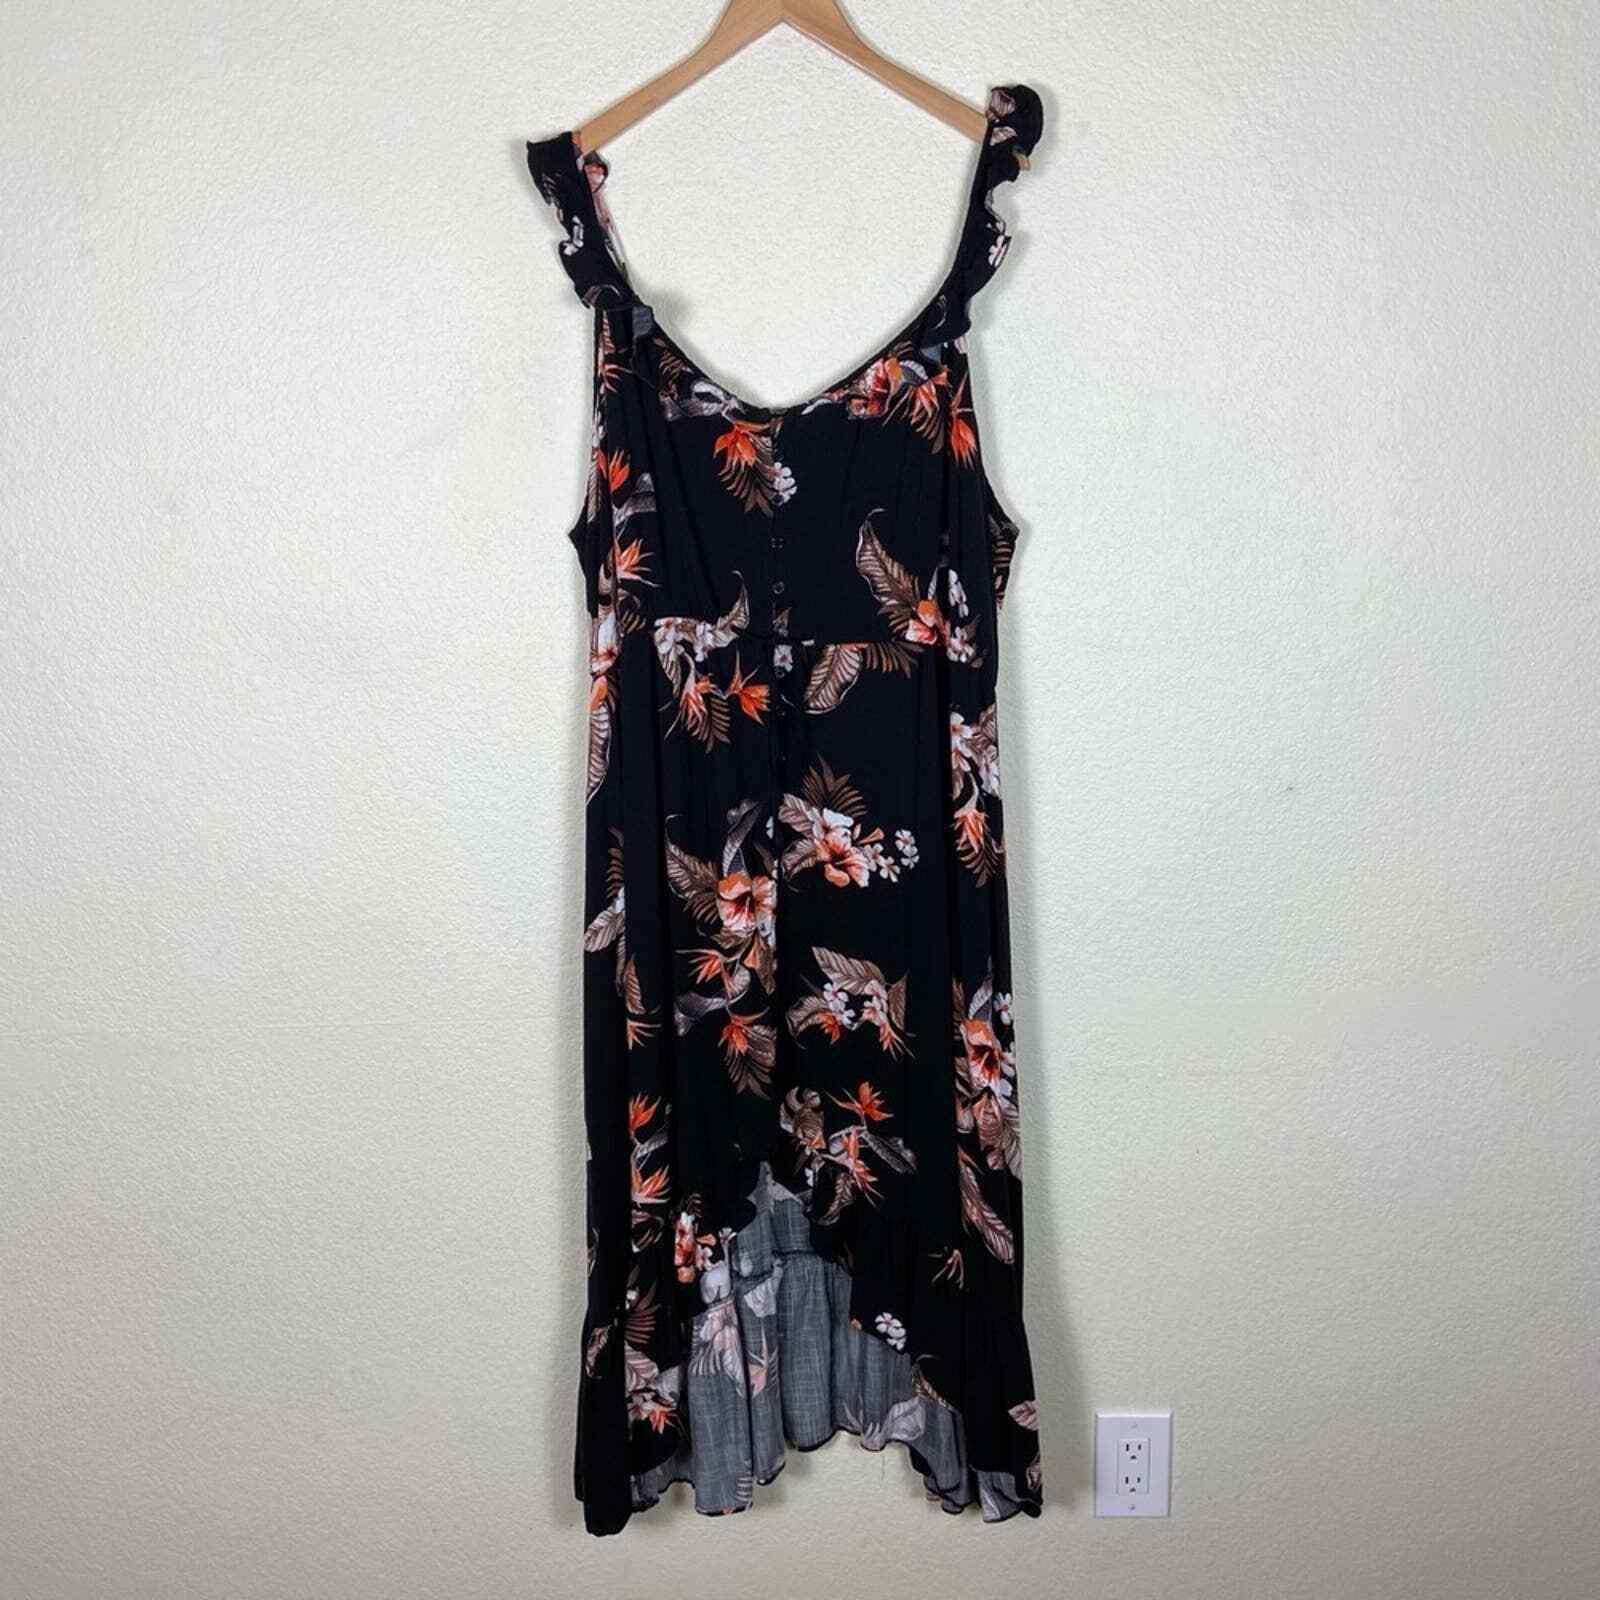 City Chic Seville Black Floral Swing Midi Dress - image 3